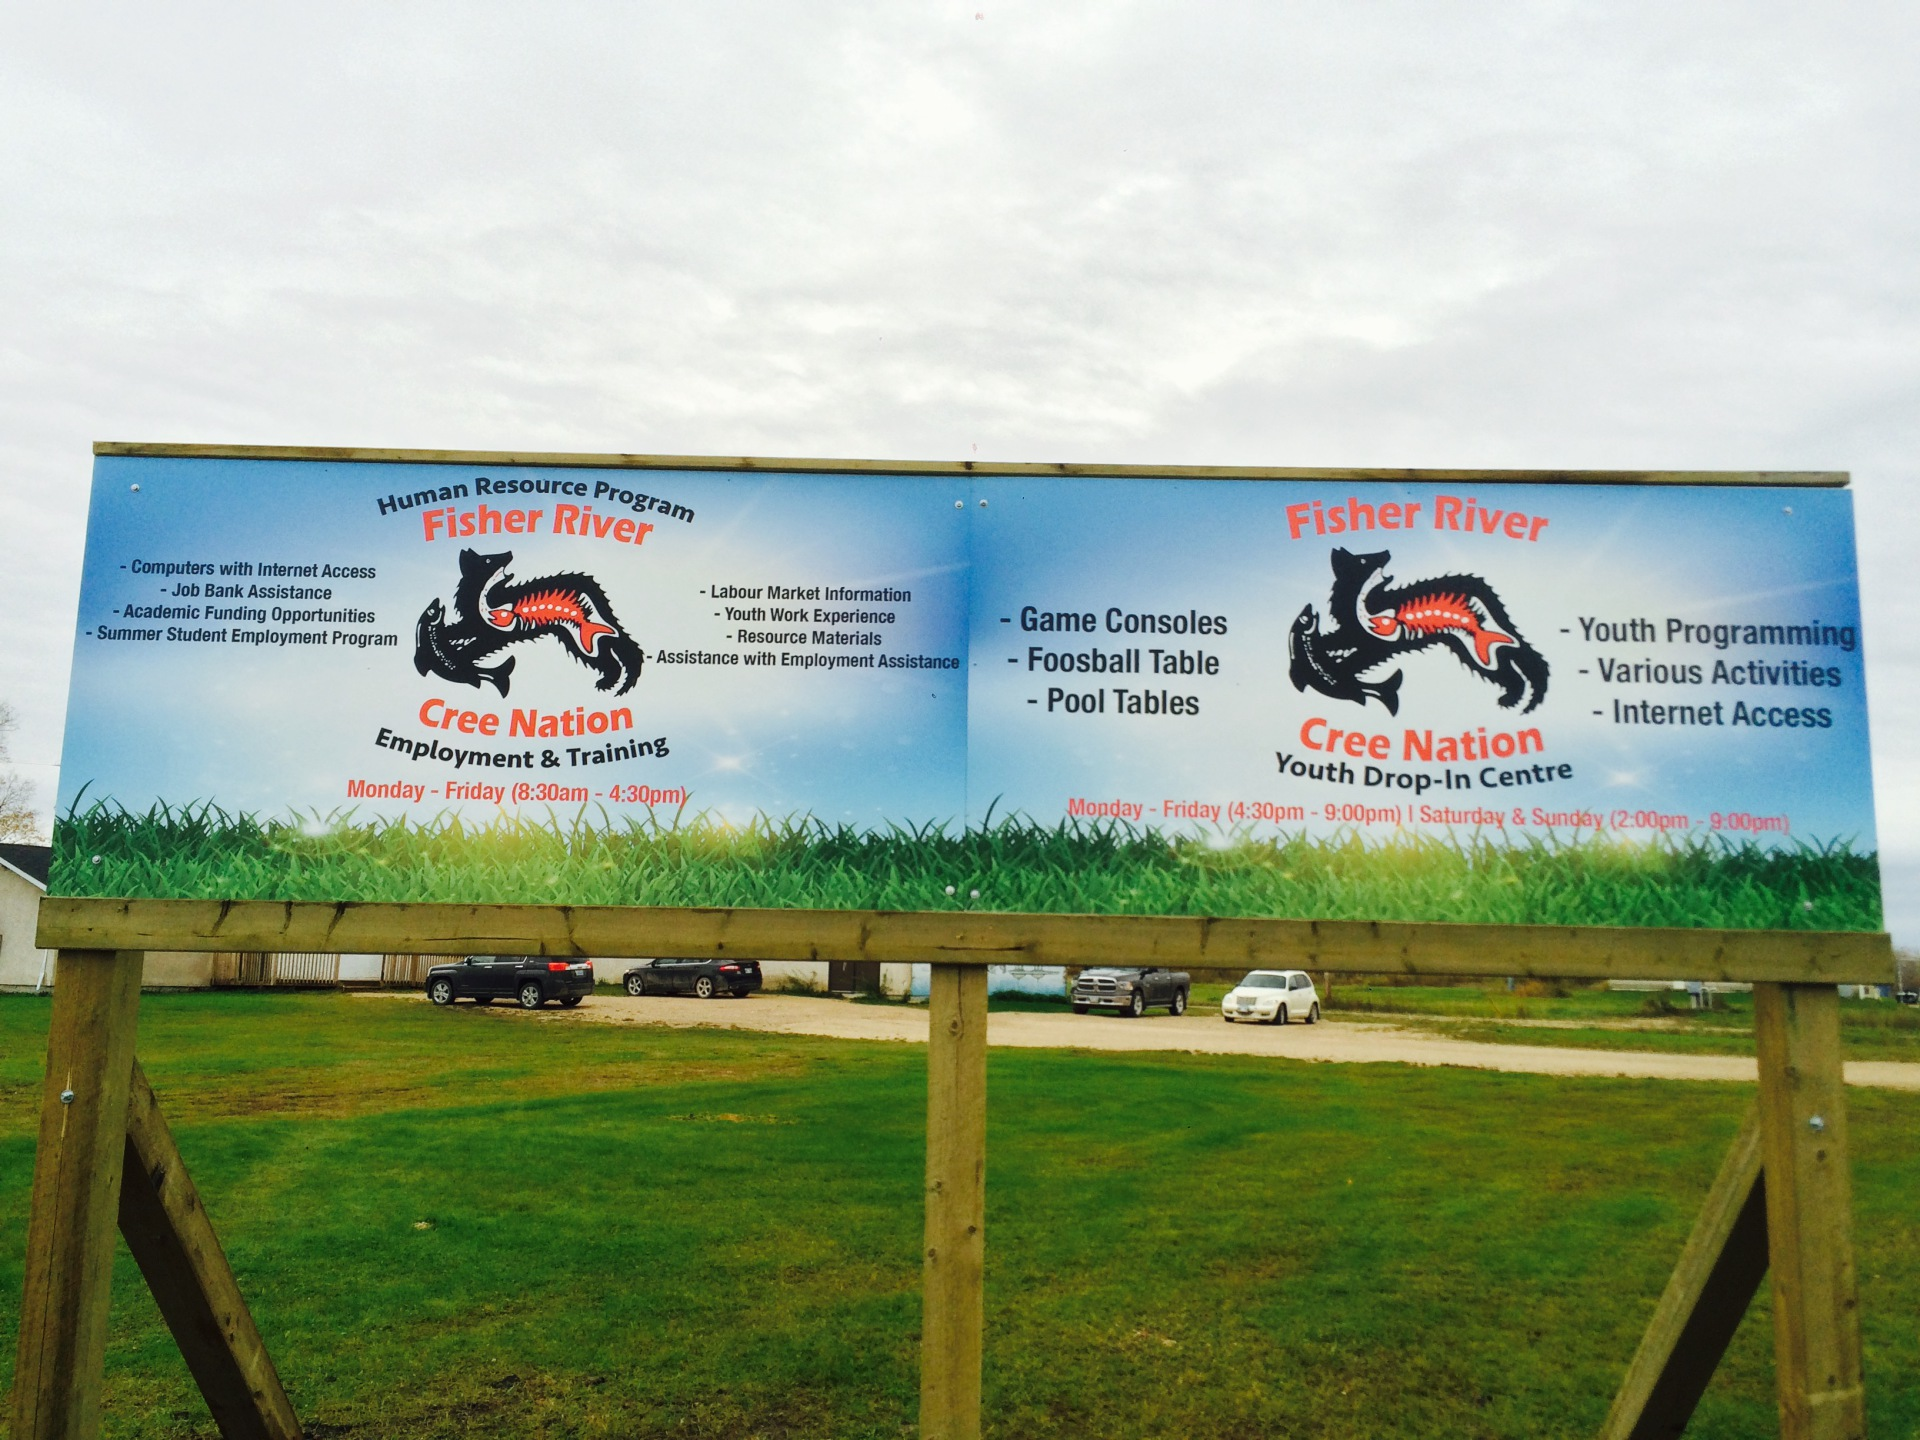 Fisher River Human Resource Program - Billboard